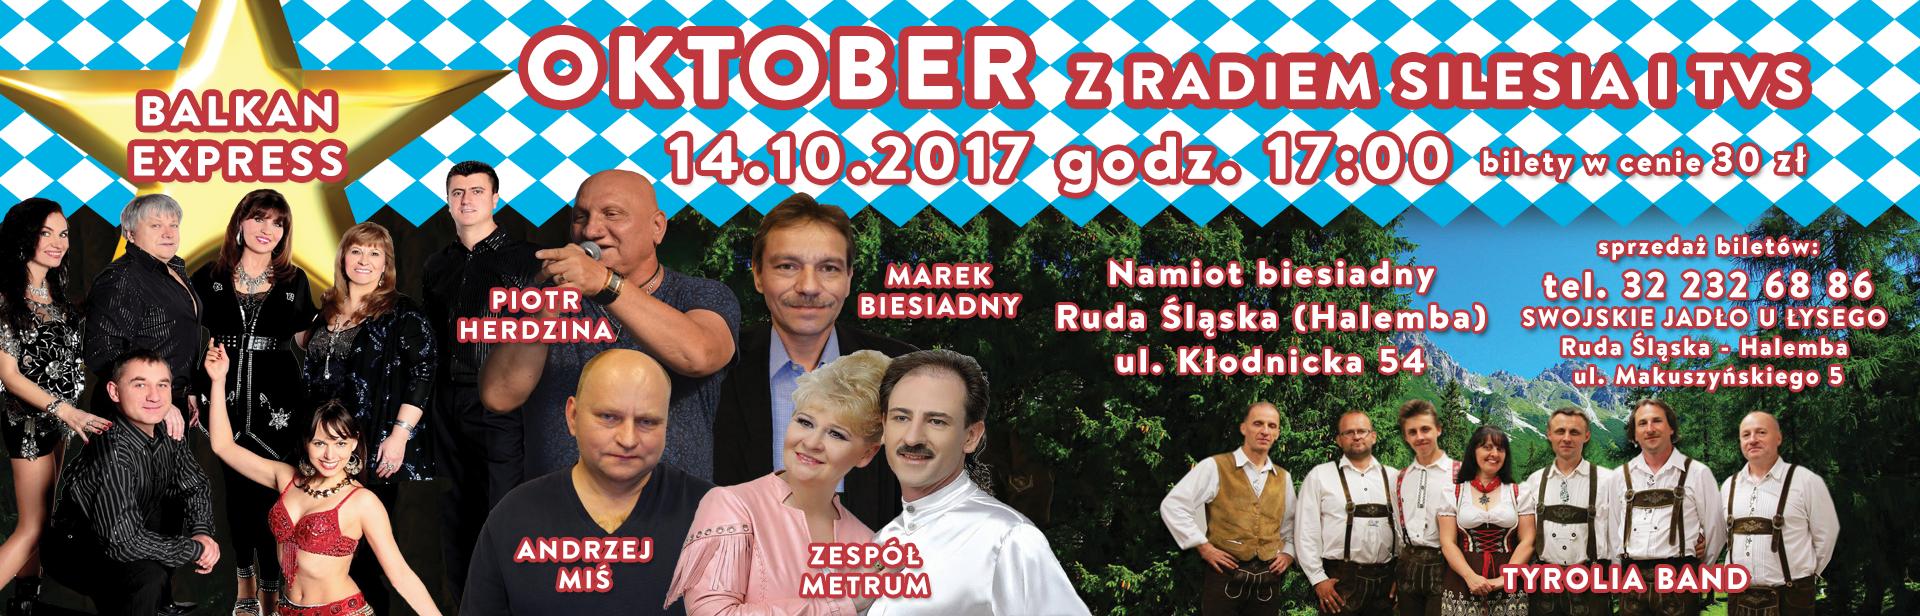 http://silesia.fm/wp-content/uploads/2017/09/WWW_Oktober-z-Radiem-Silesia_14_10_2017.png